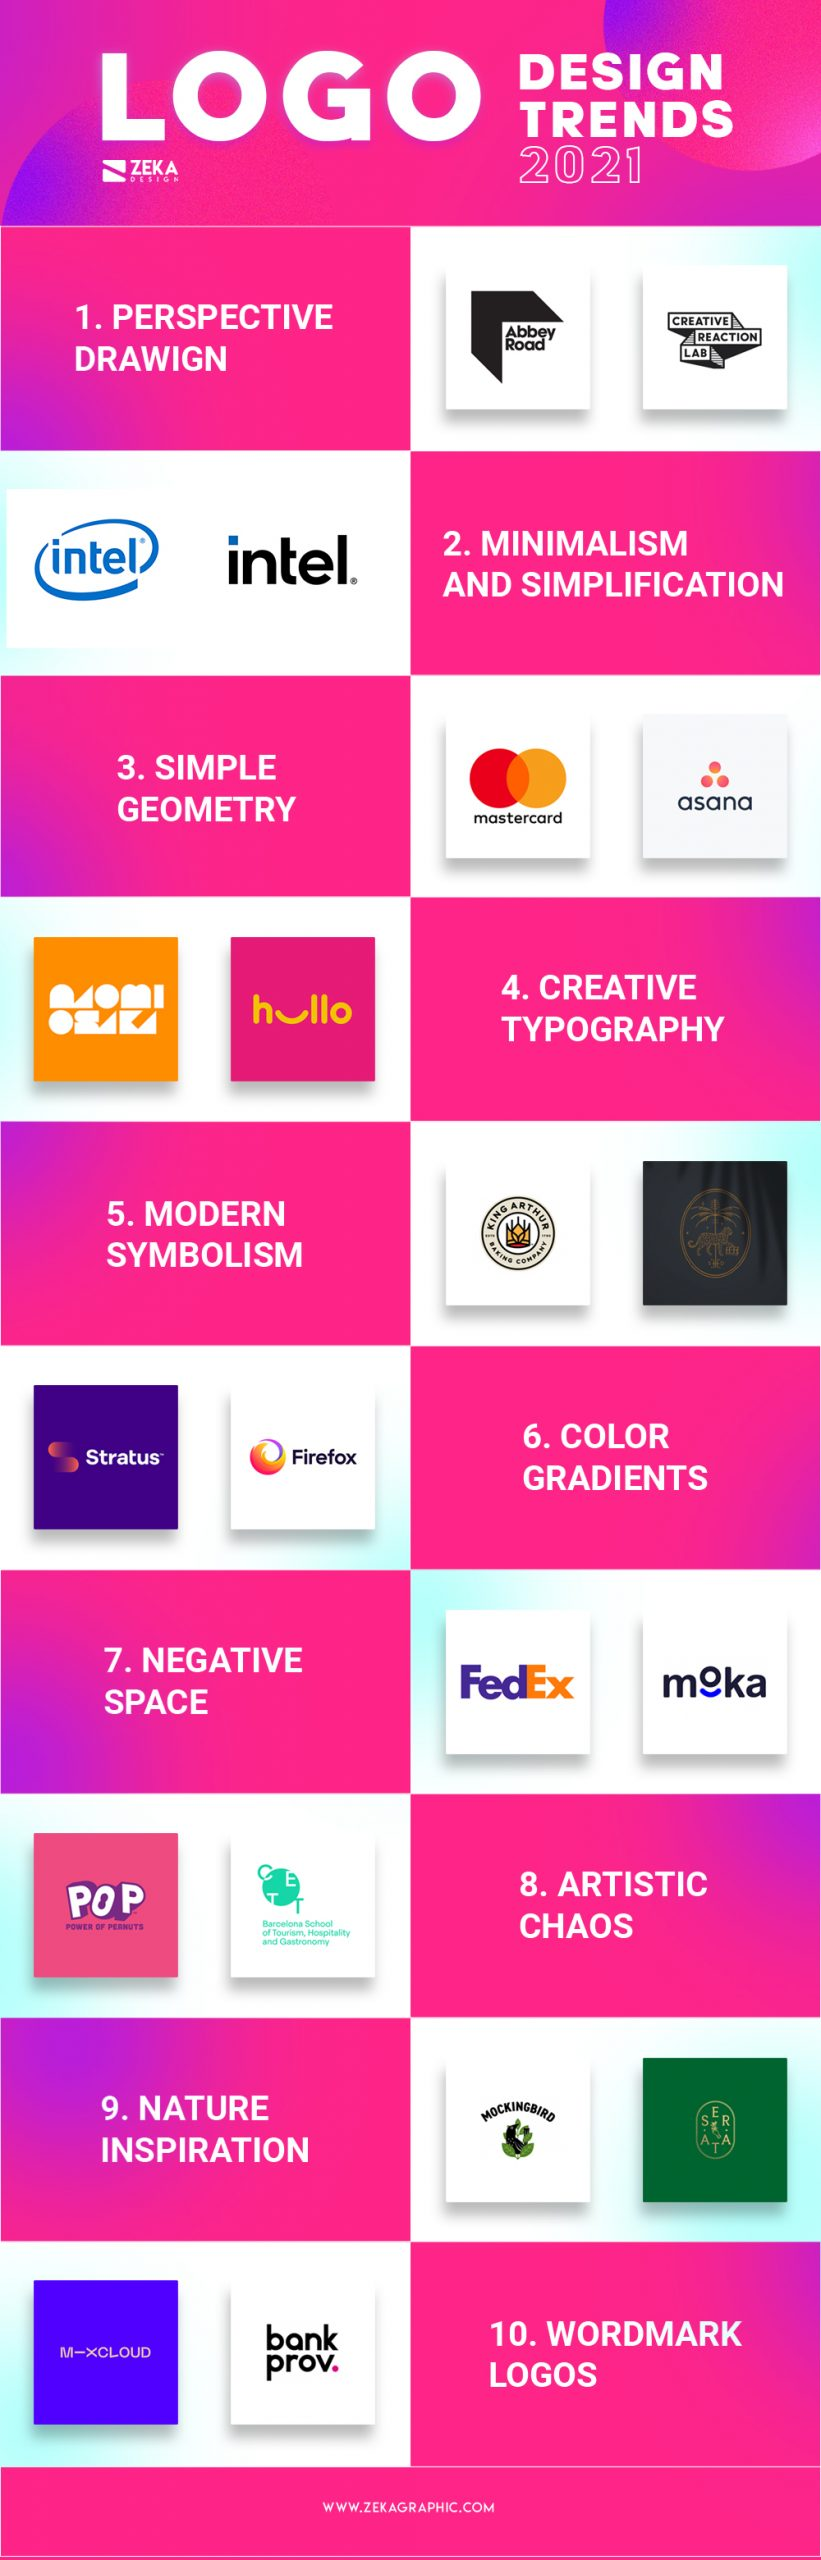 Logo Design Trends For 2021 Graphic Design Guide